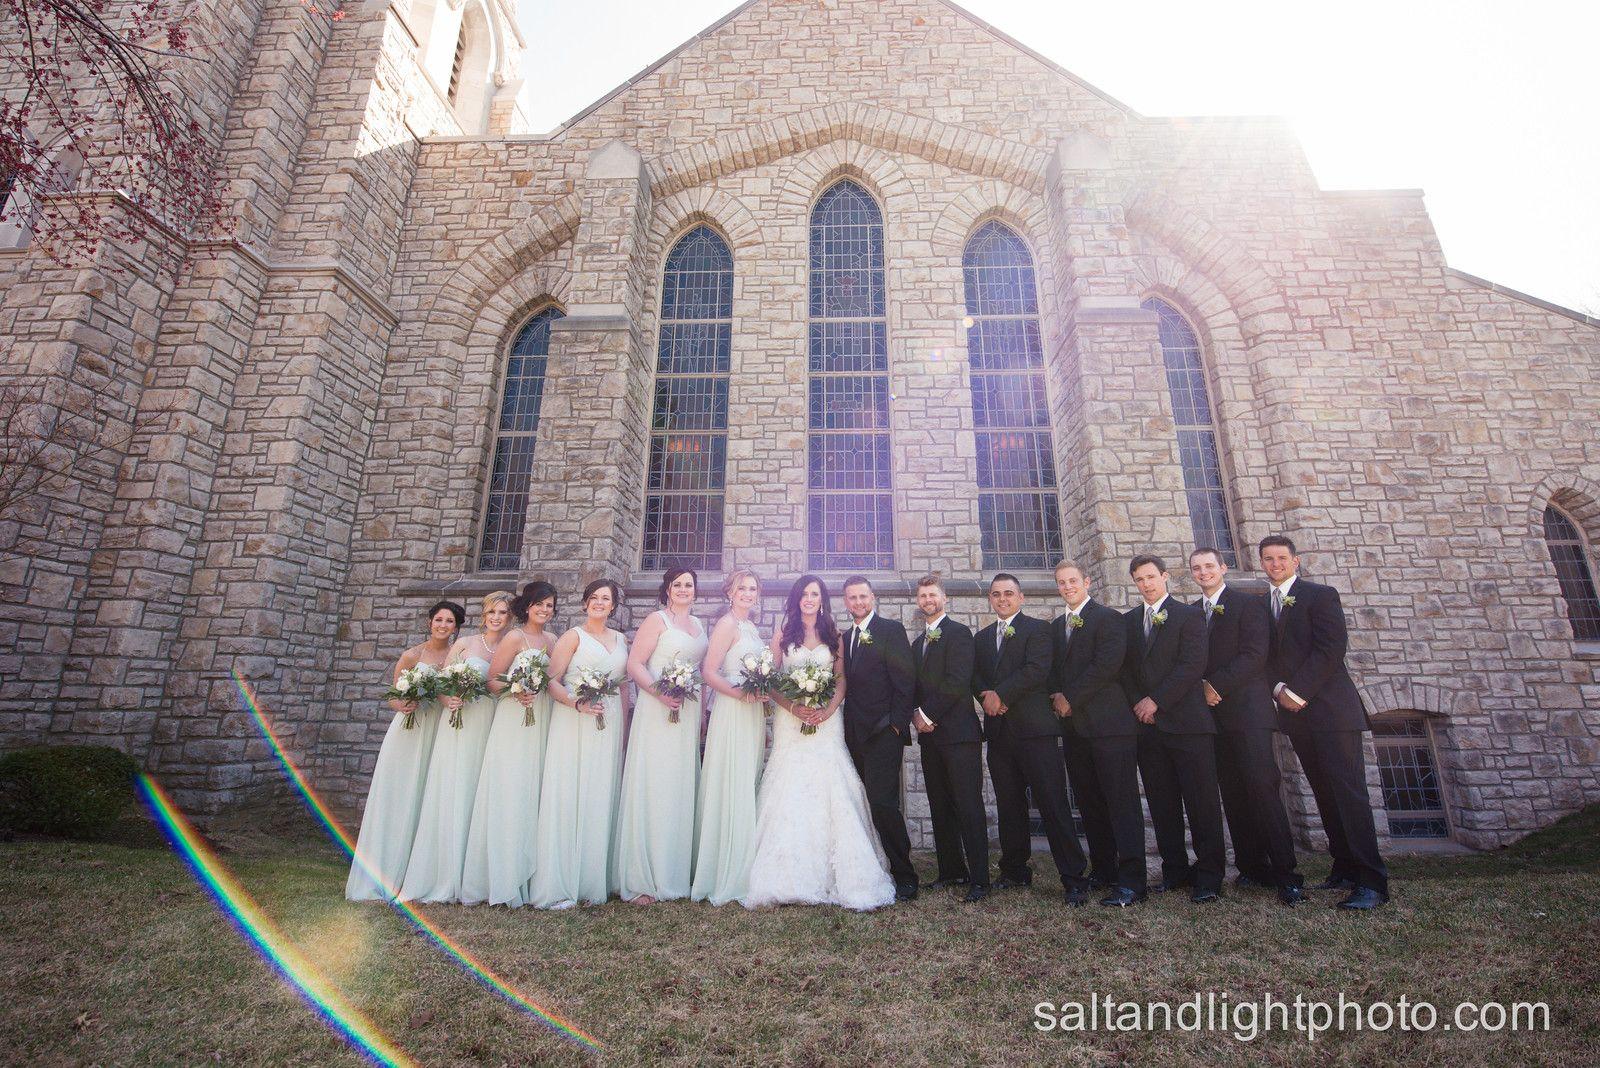 Salt light photography kansas city wedding photos josh salt light photography kansas city wedding photos josh kiley salt ombrellifo Choice Image